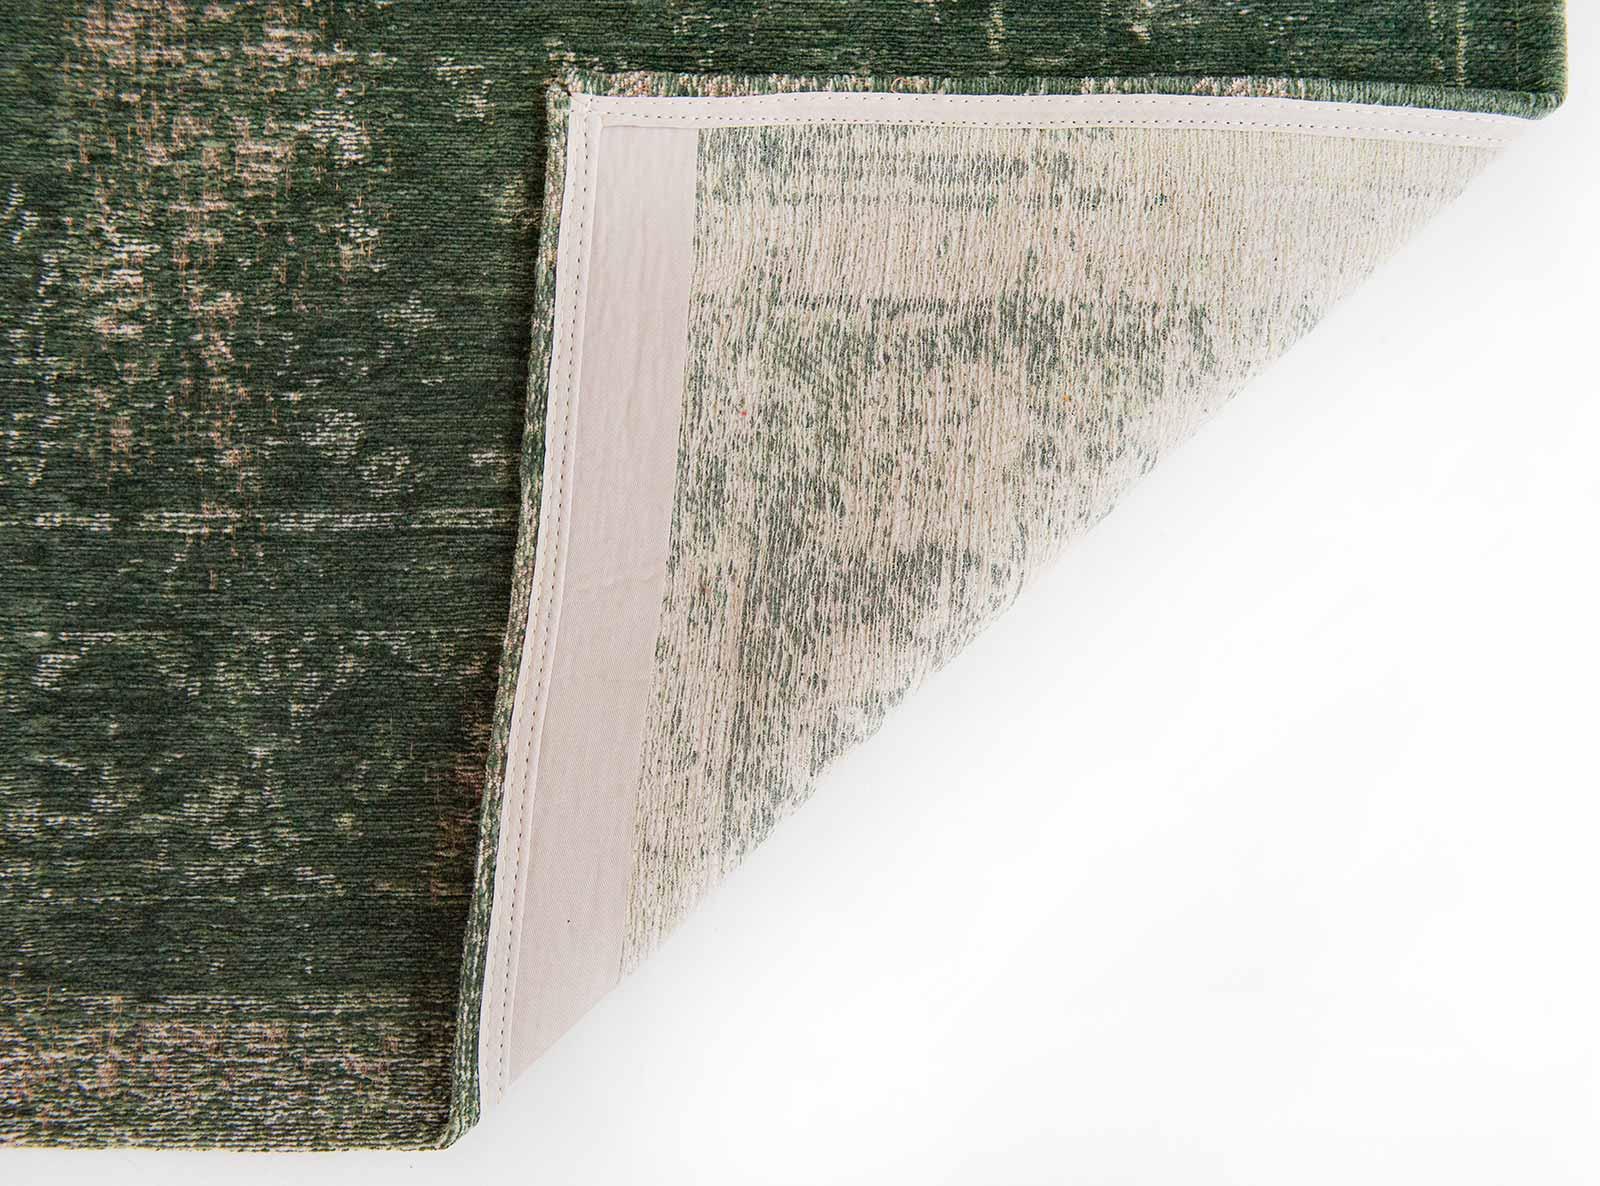 Louis De Poortere teppich LX 9146 Fading World Majestic Forest back